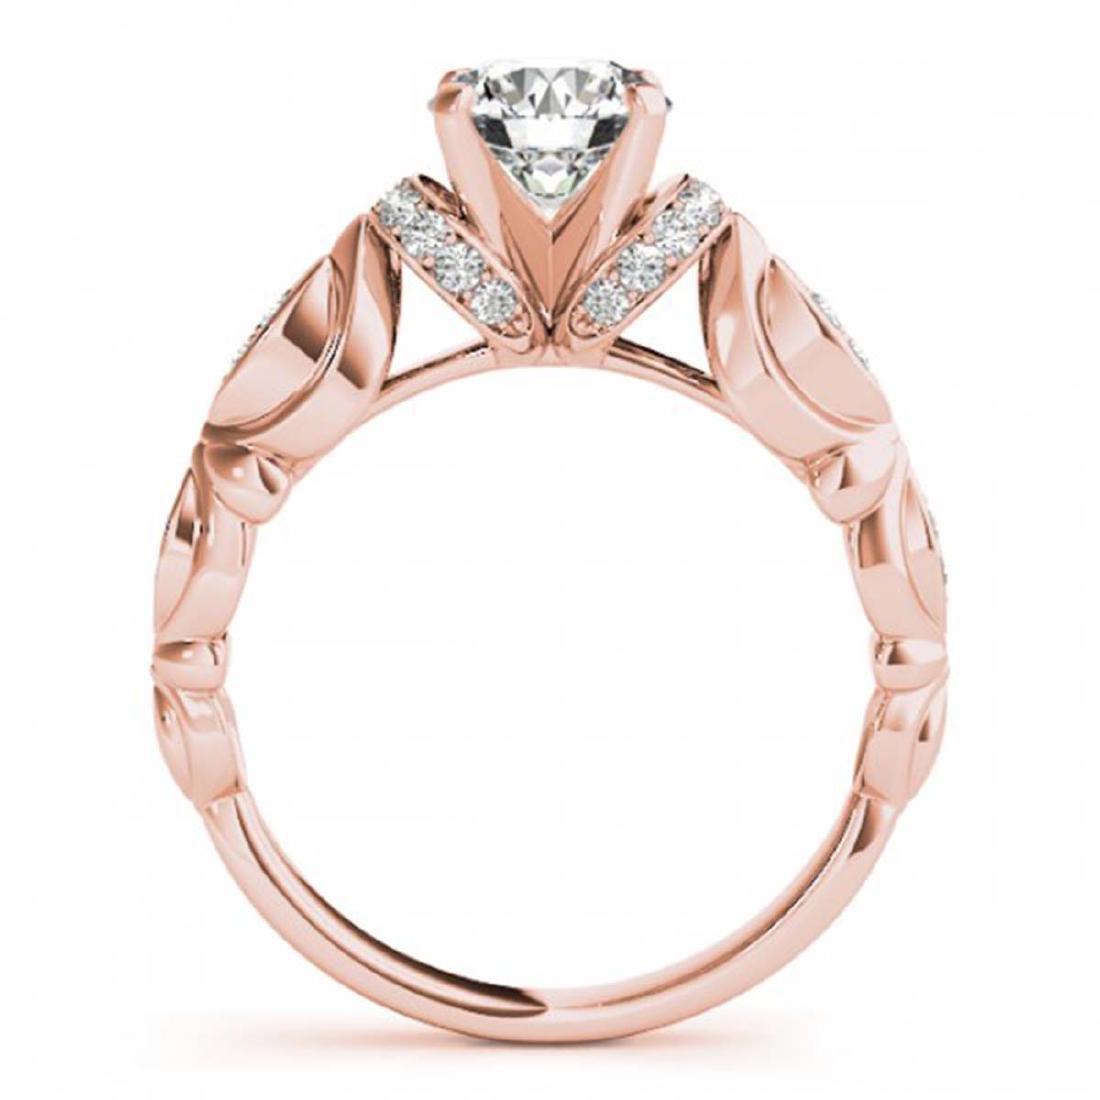 0.95 ctw VS/SI Diamond Ring 18K Rose Gold - REF-150A5V - 2